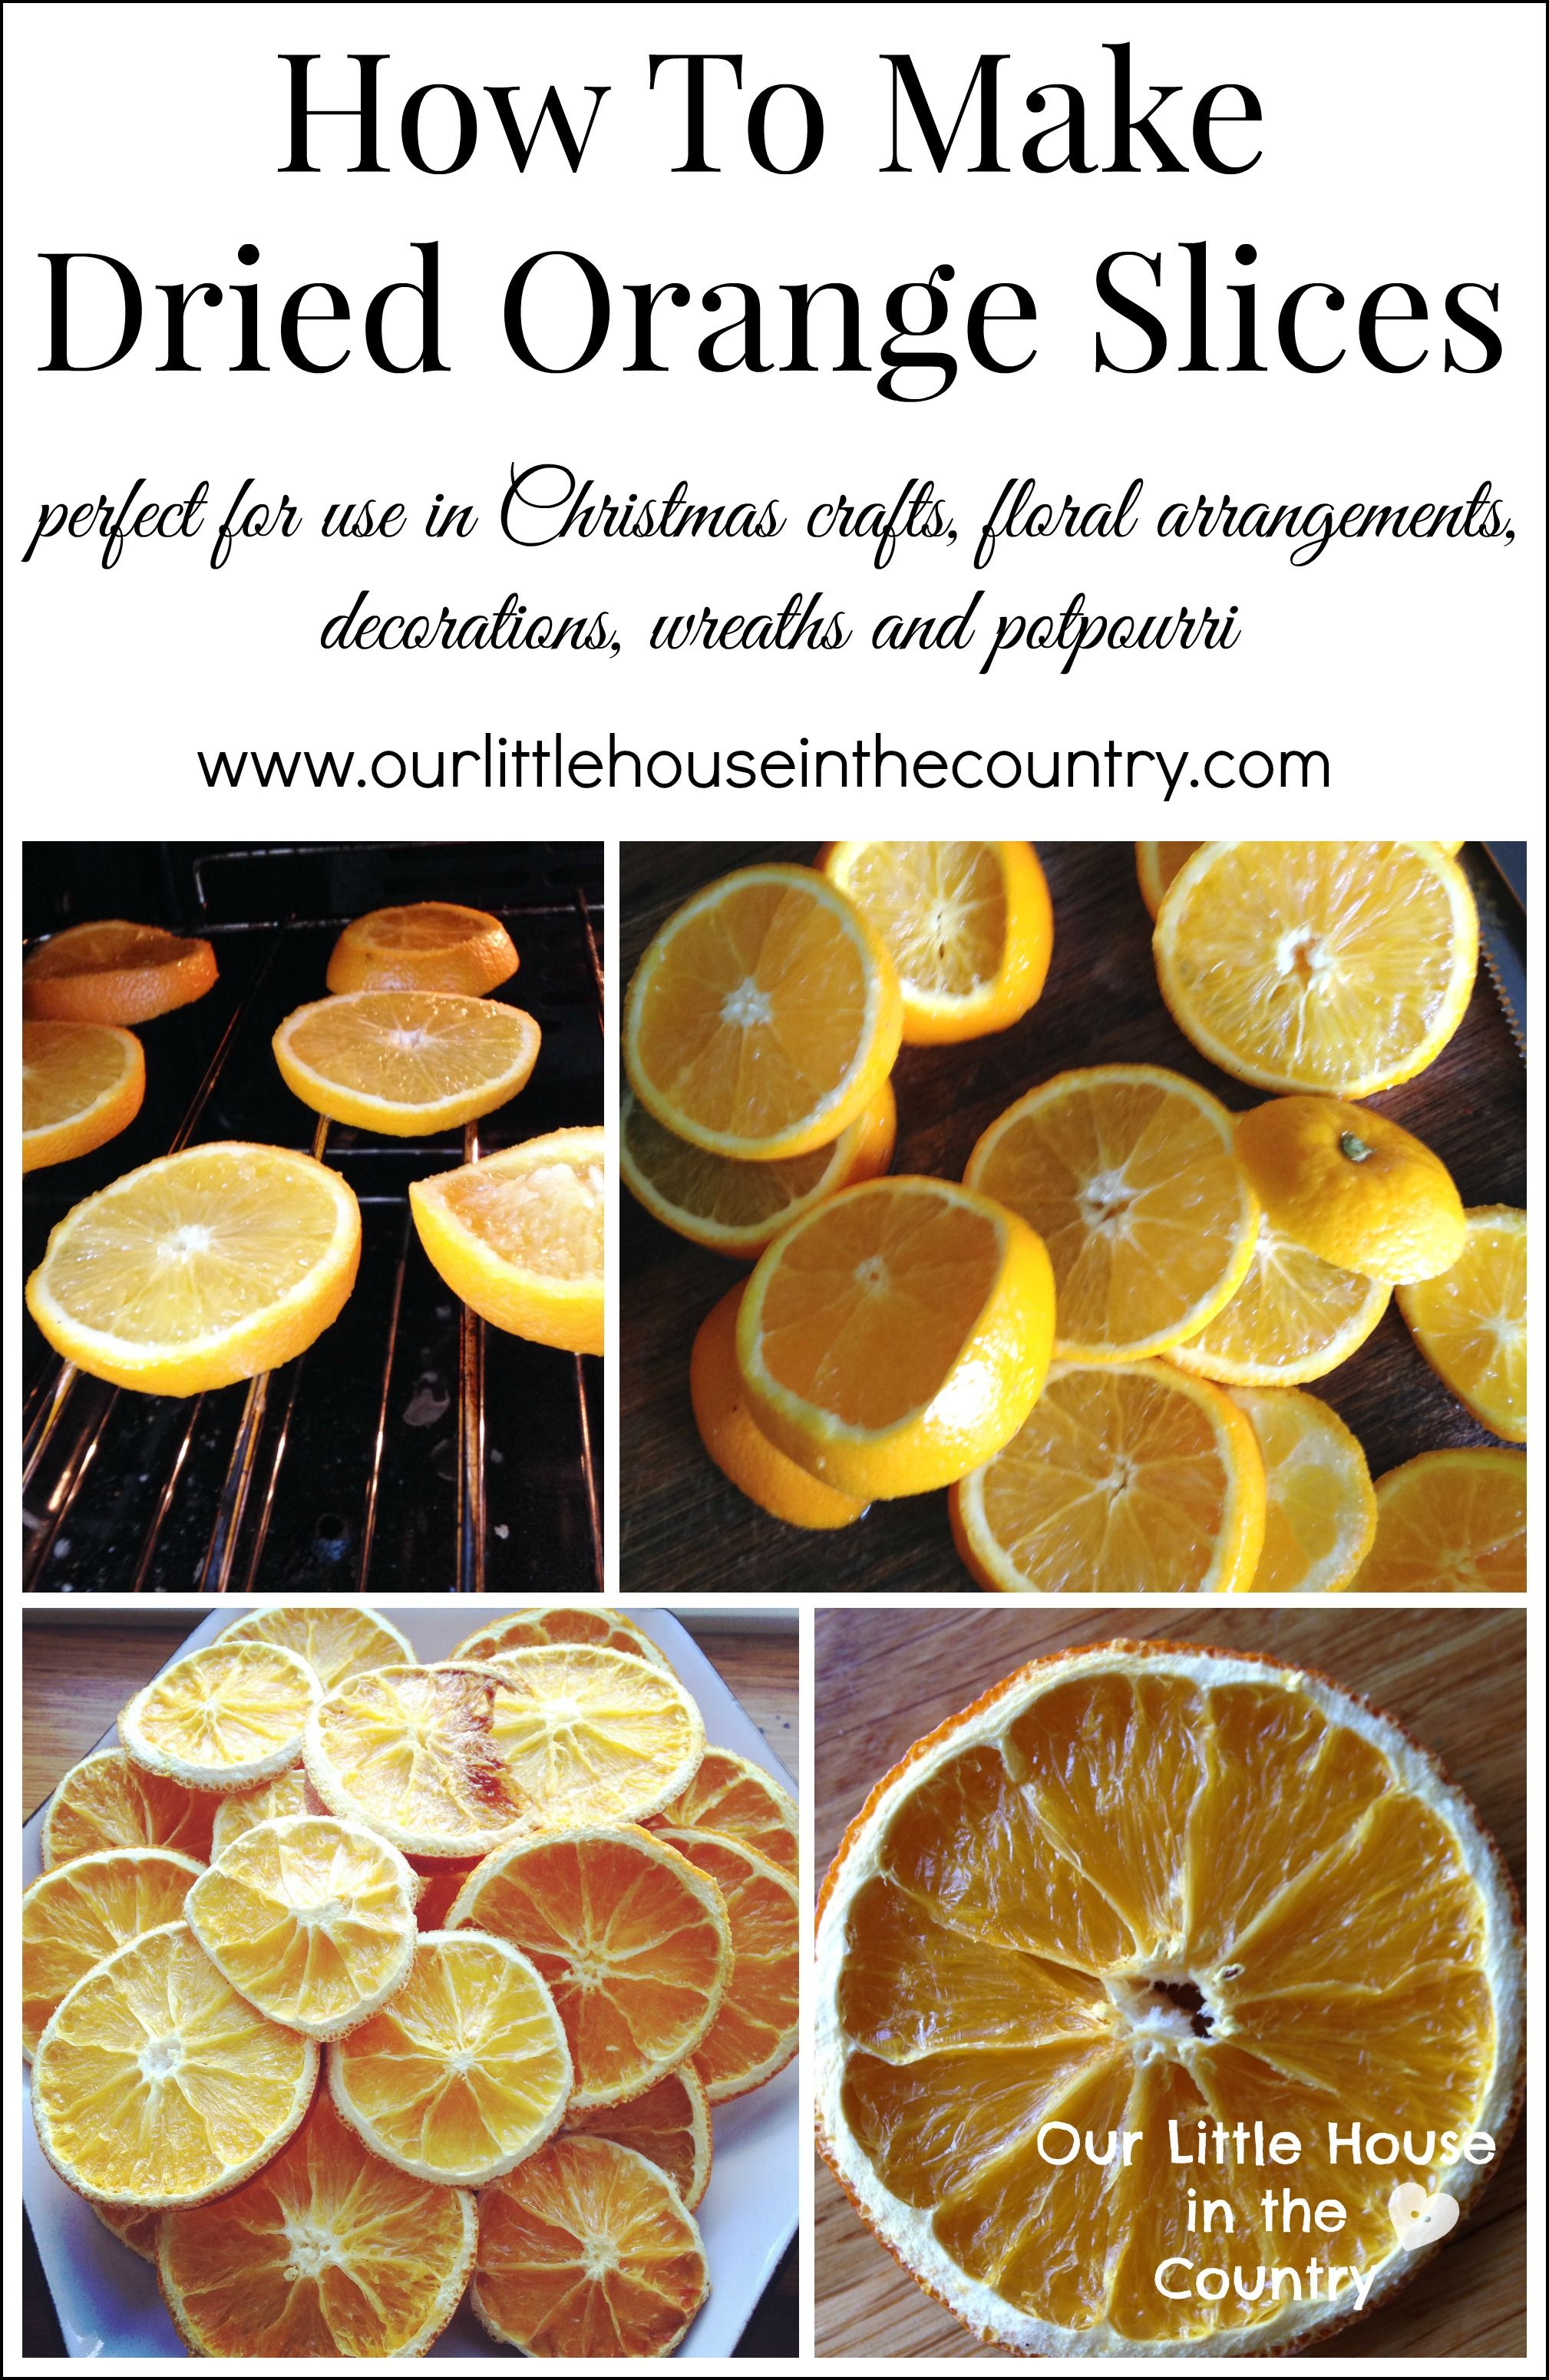 How To Make Dried Orange Slices Christmas Crafts Dried Orange Slices Orange Slices